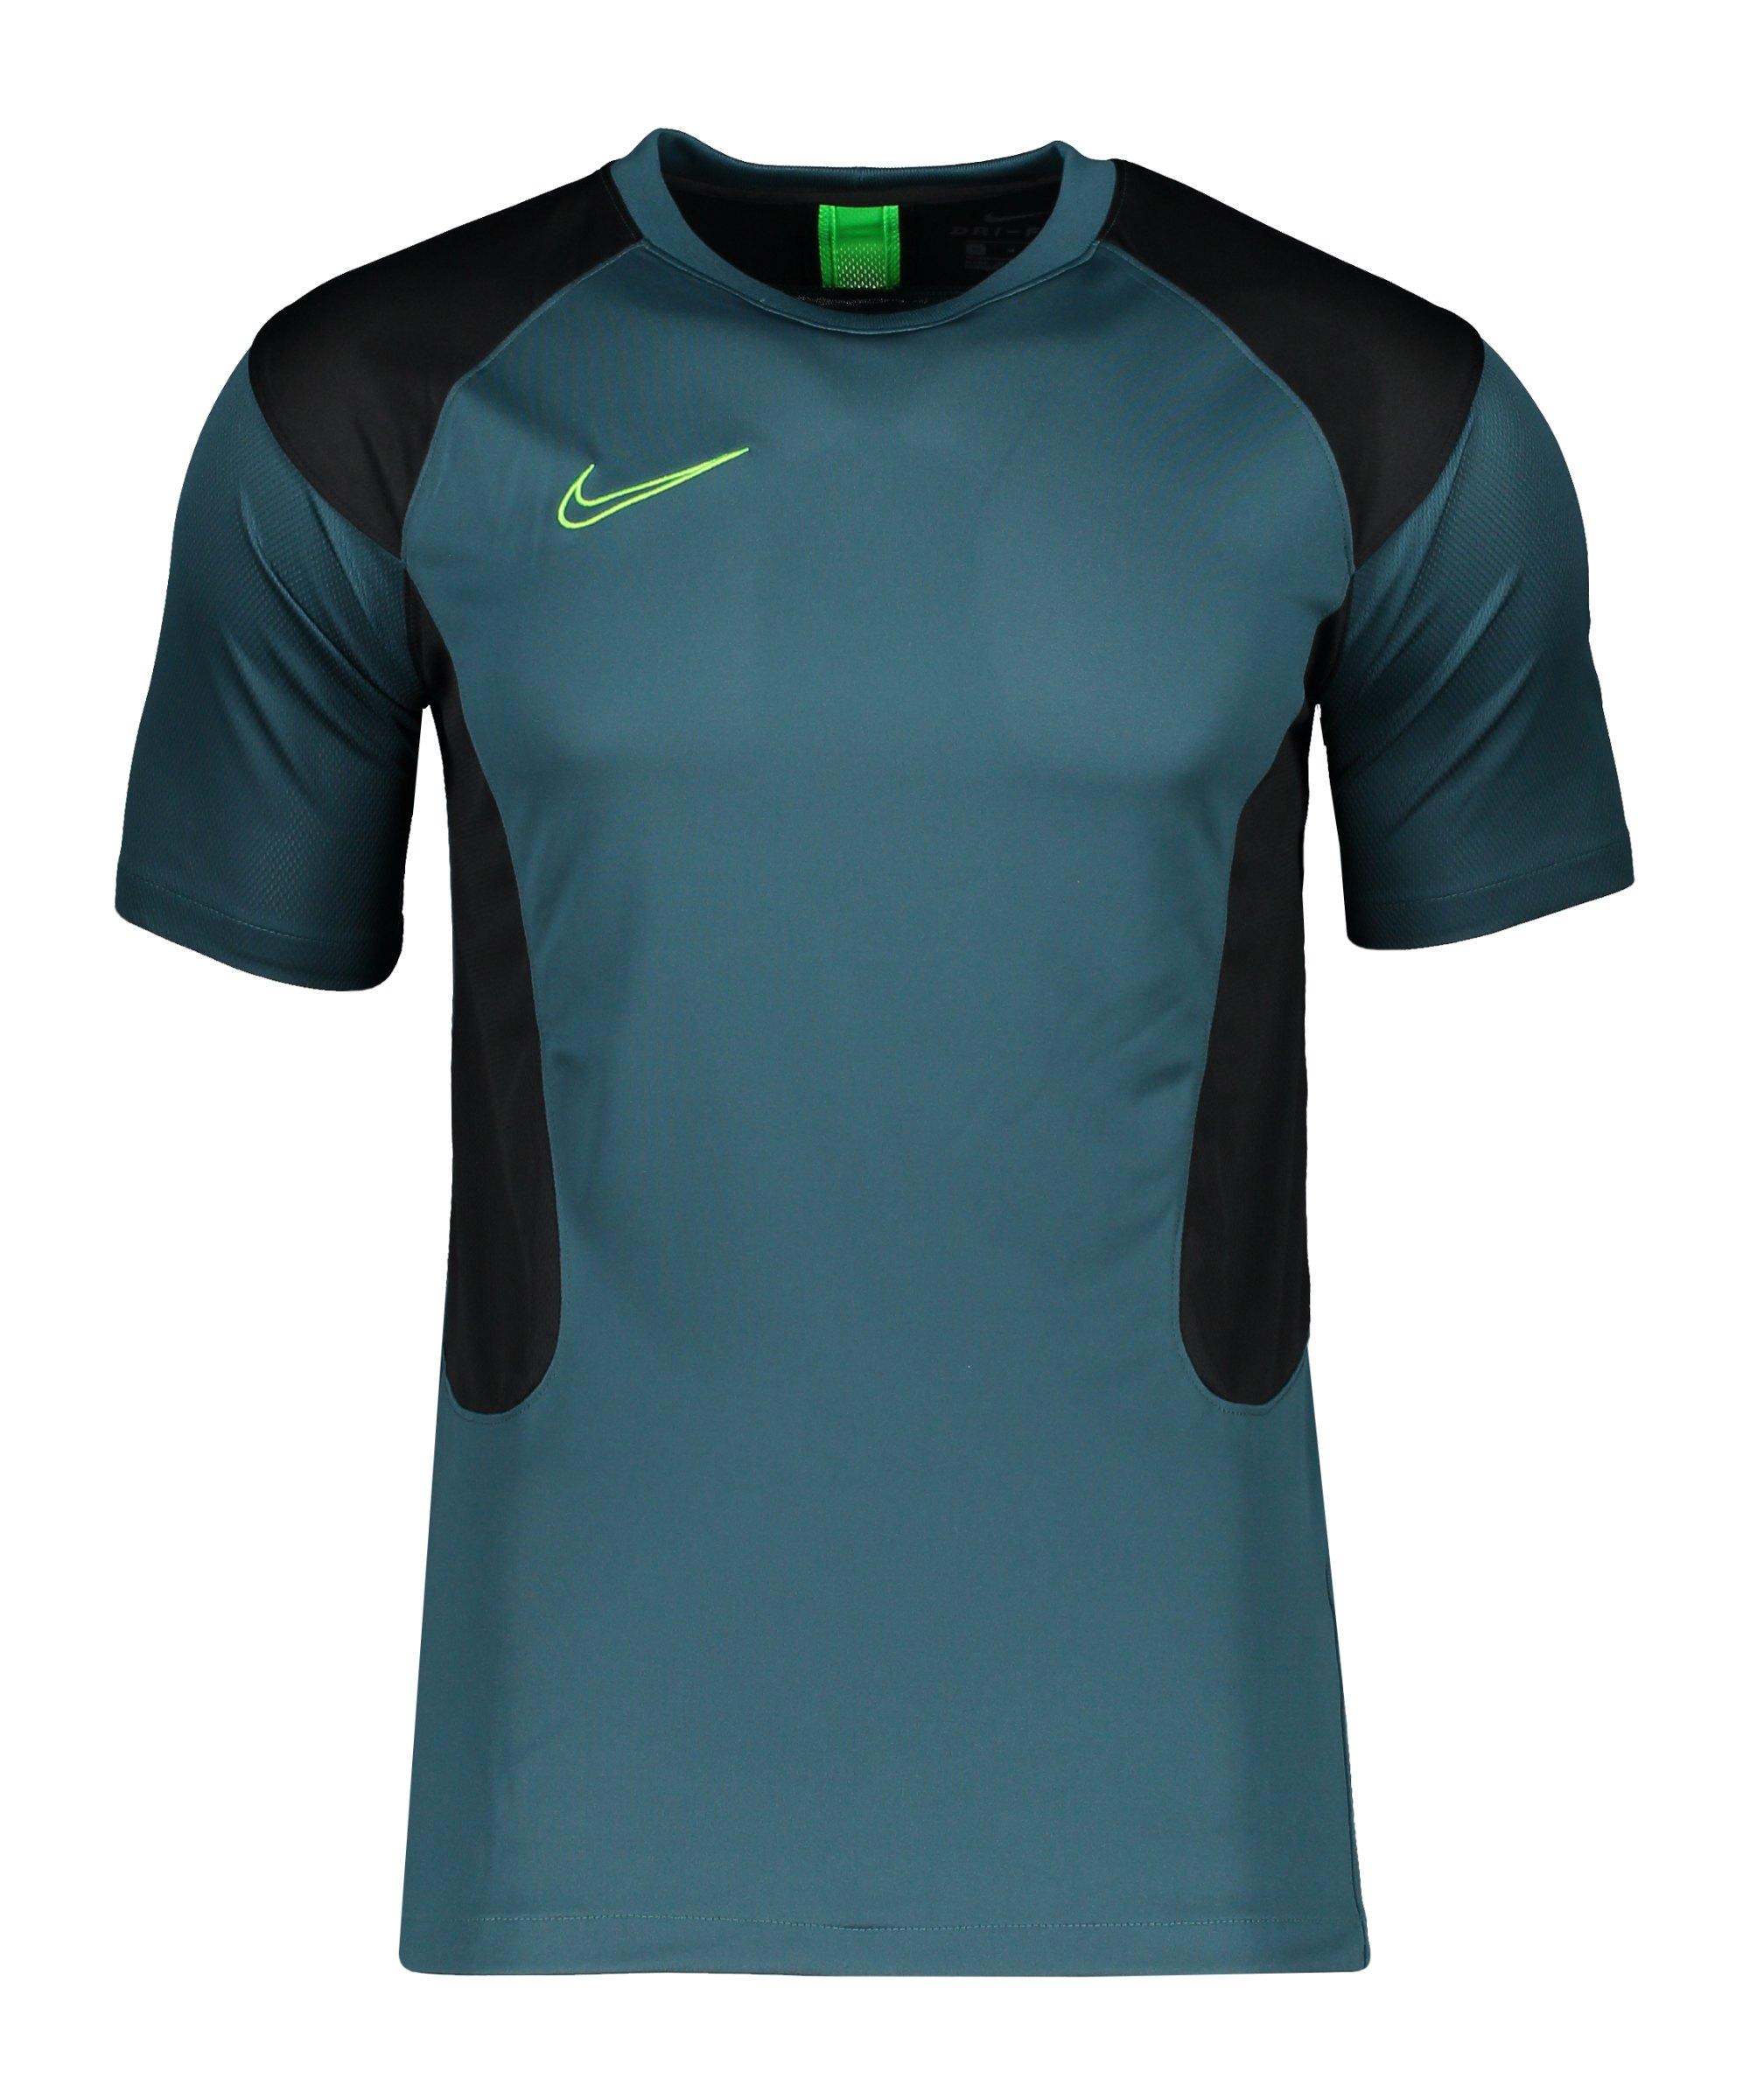 Nike Dry Academy T-Shirt Grün Schwarz F393 - gruen